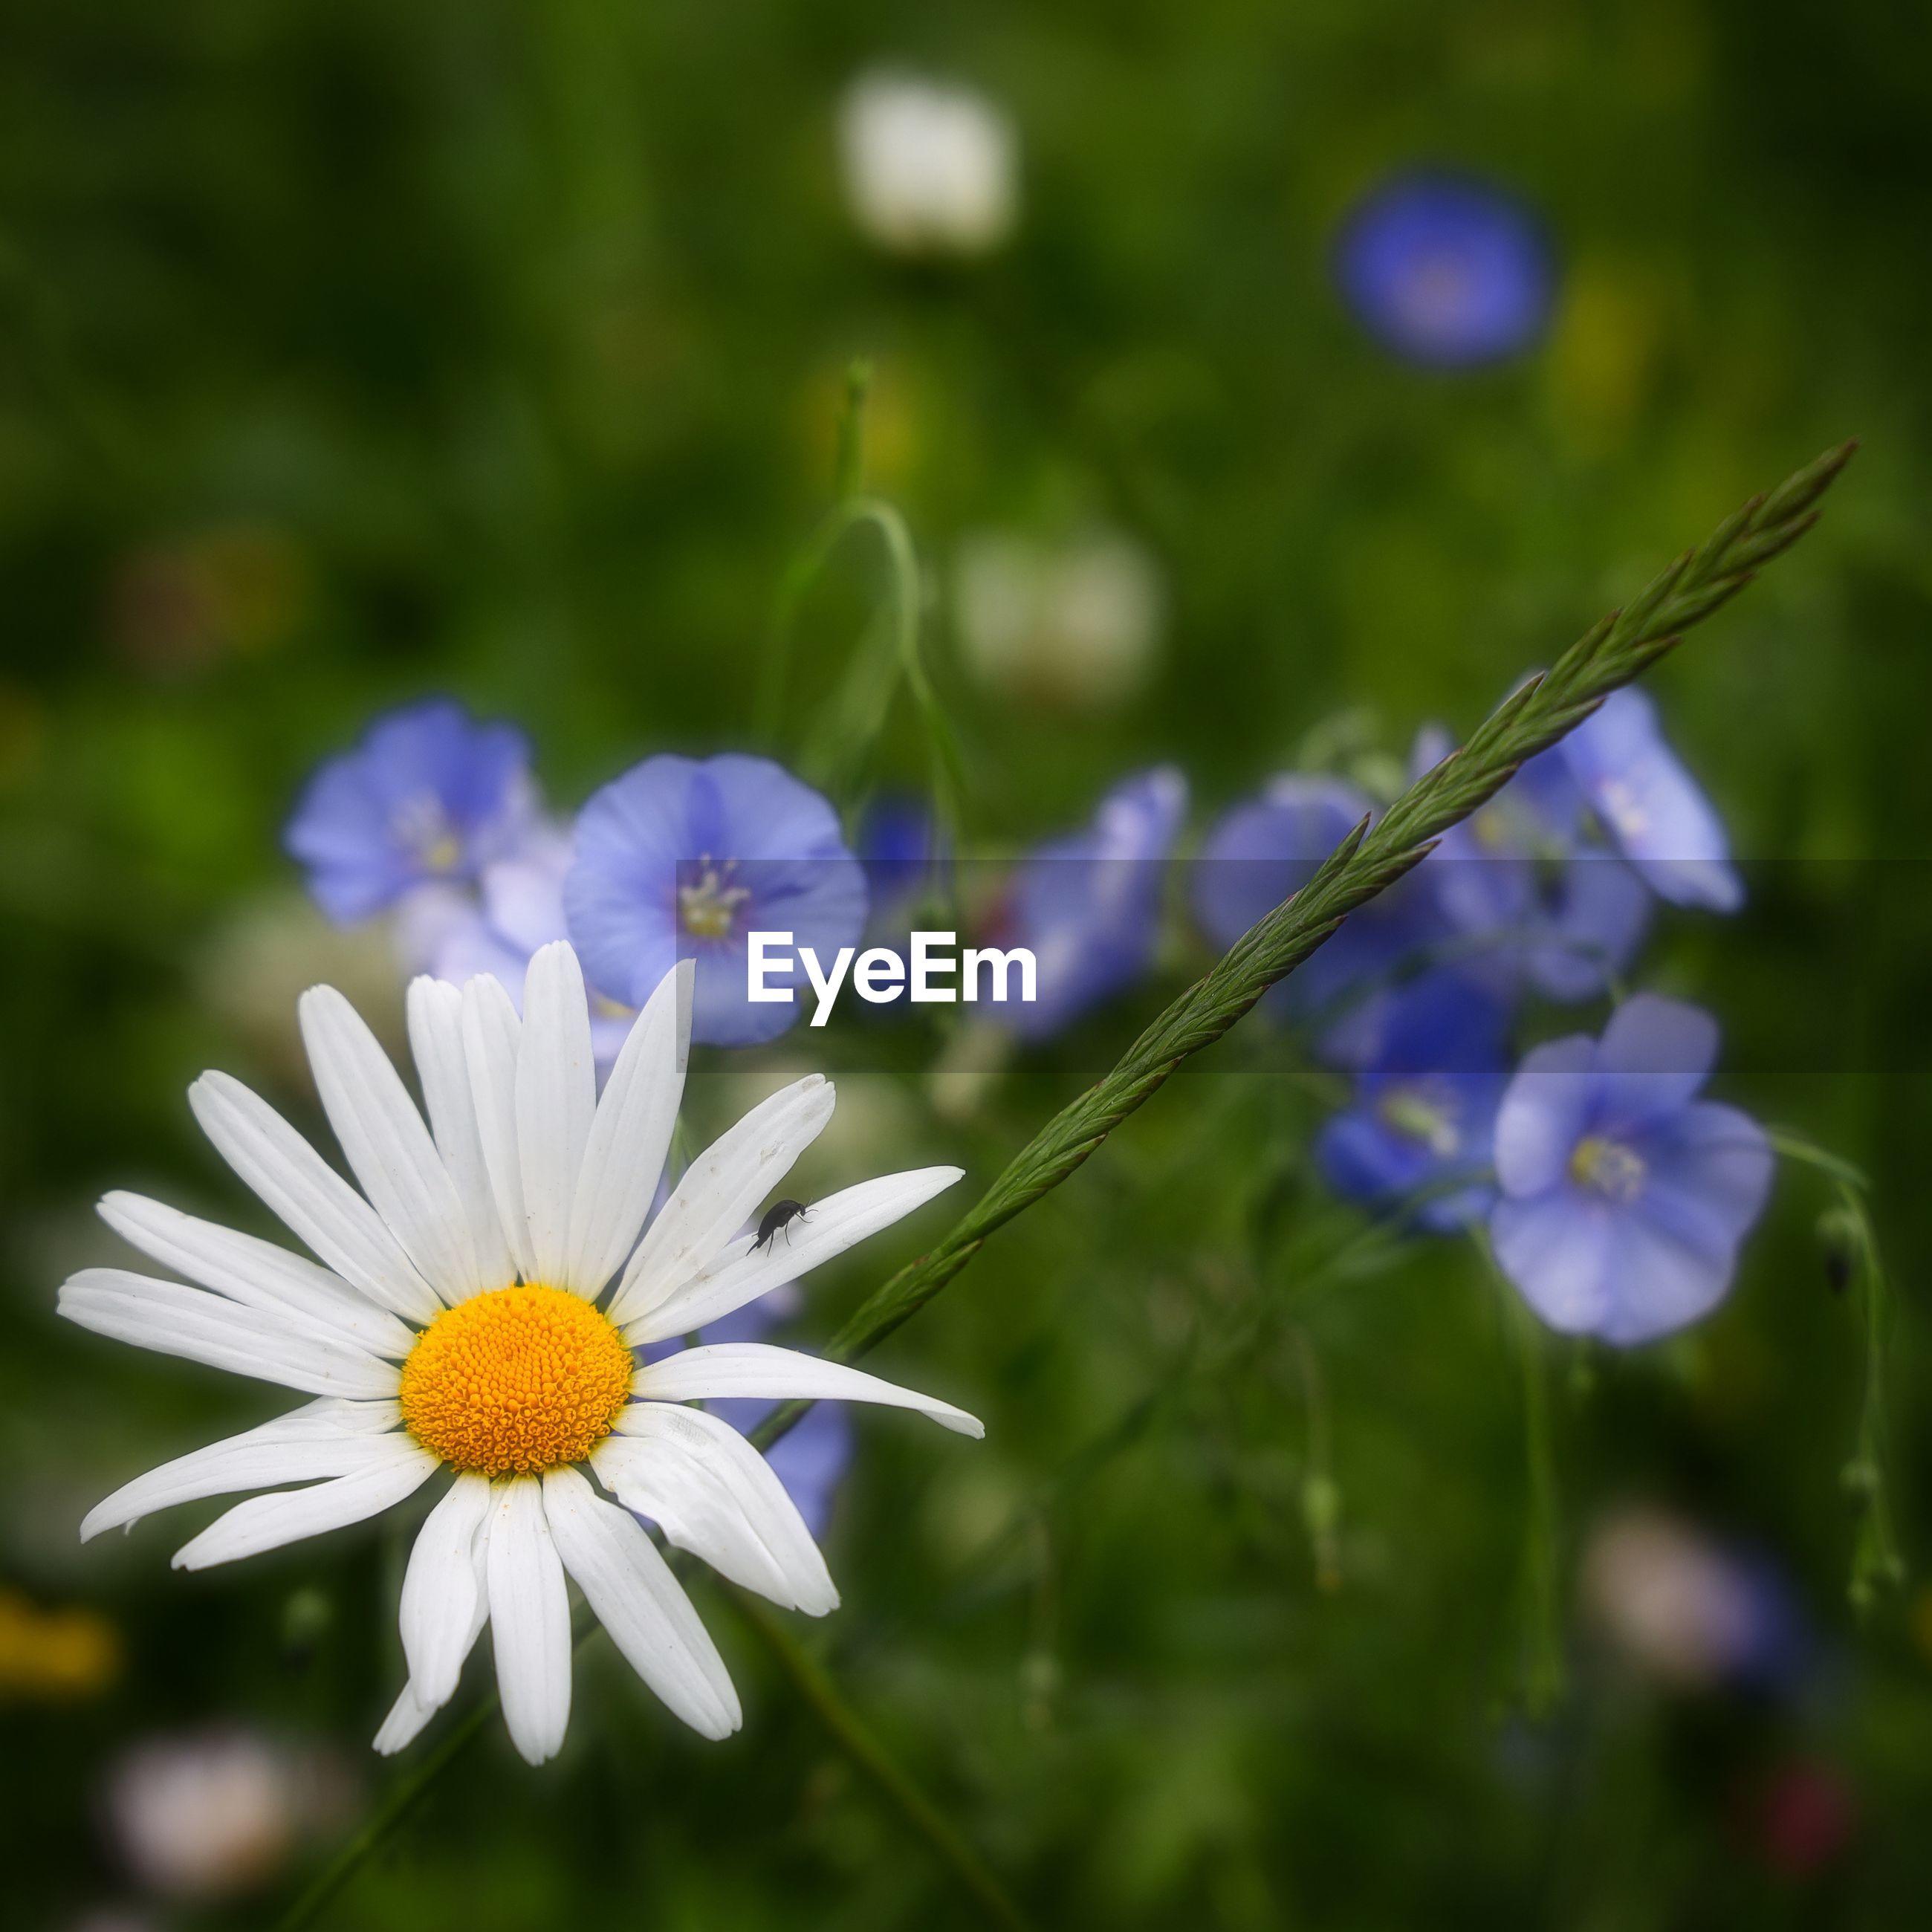 CLOSE-UP OF PURPLE DAISY FLOWERS GROWING ON FIELD